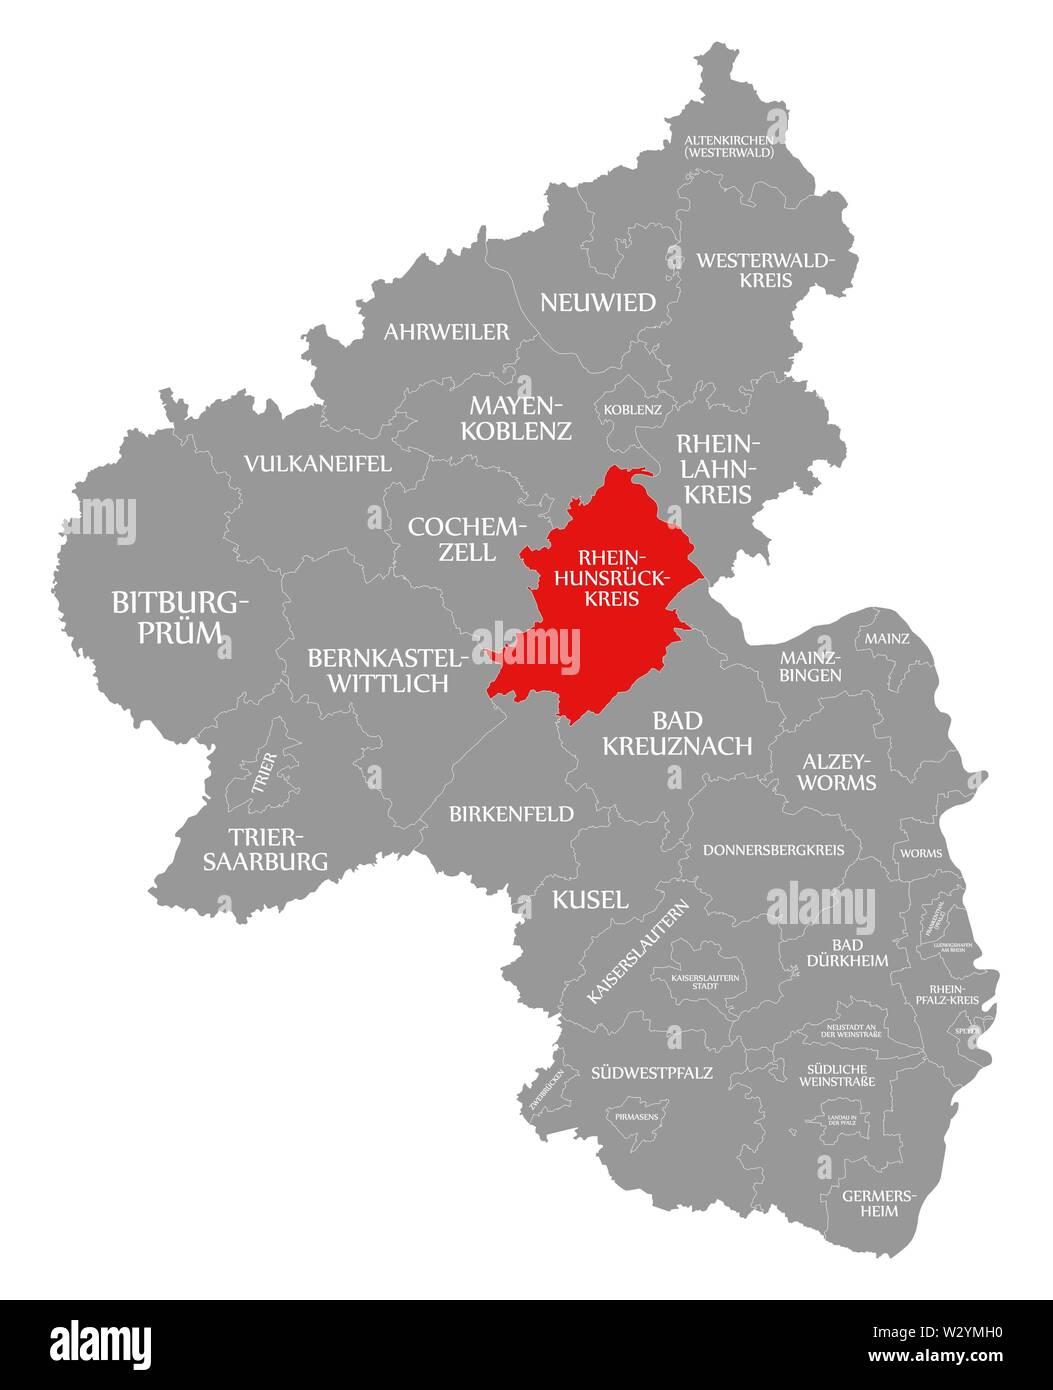 Rhein Hunsrueck Kreis red highlighted in map of Rhineland Palatinate DE - Stock Image